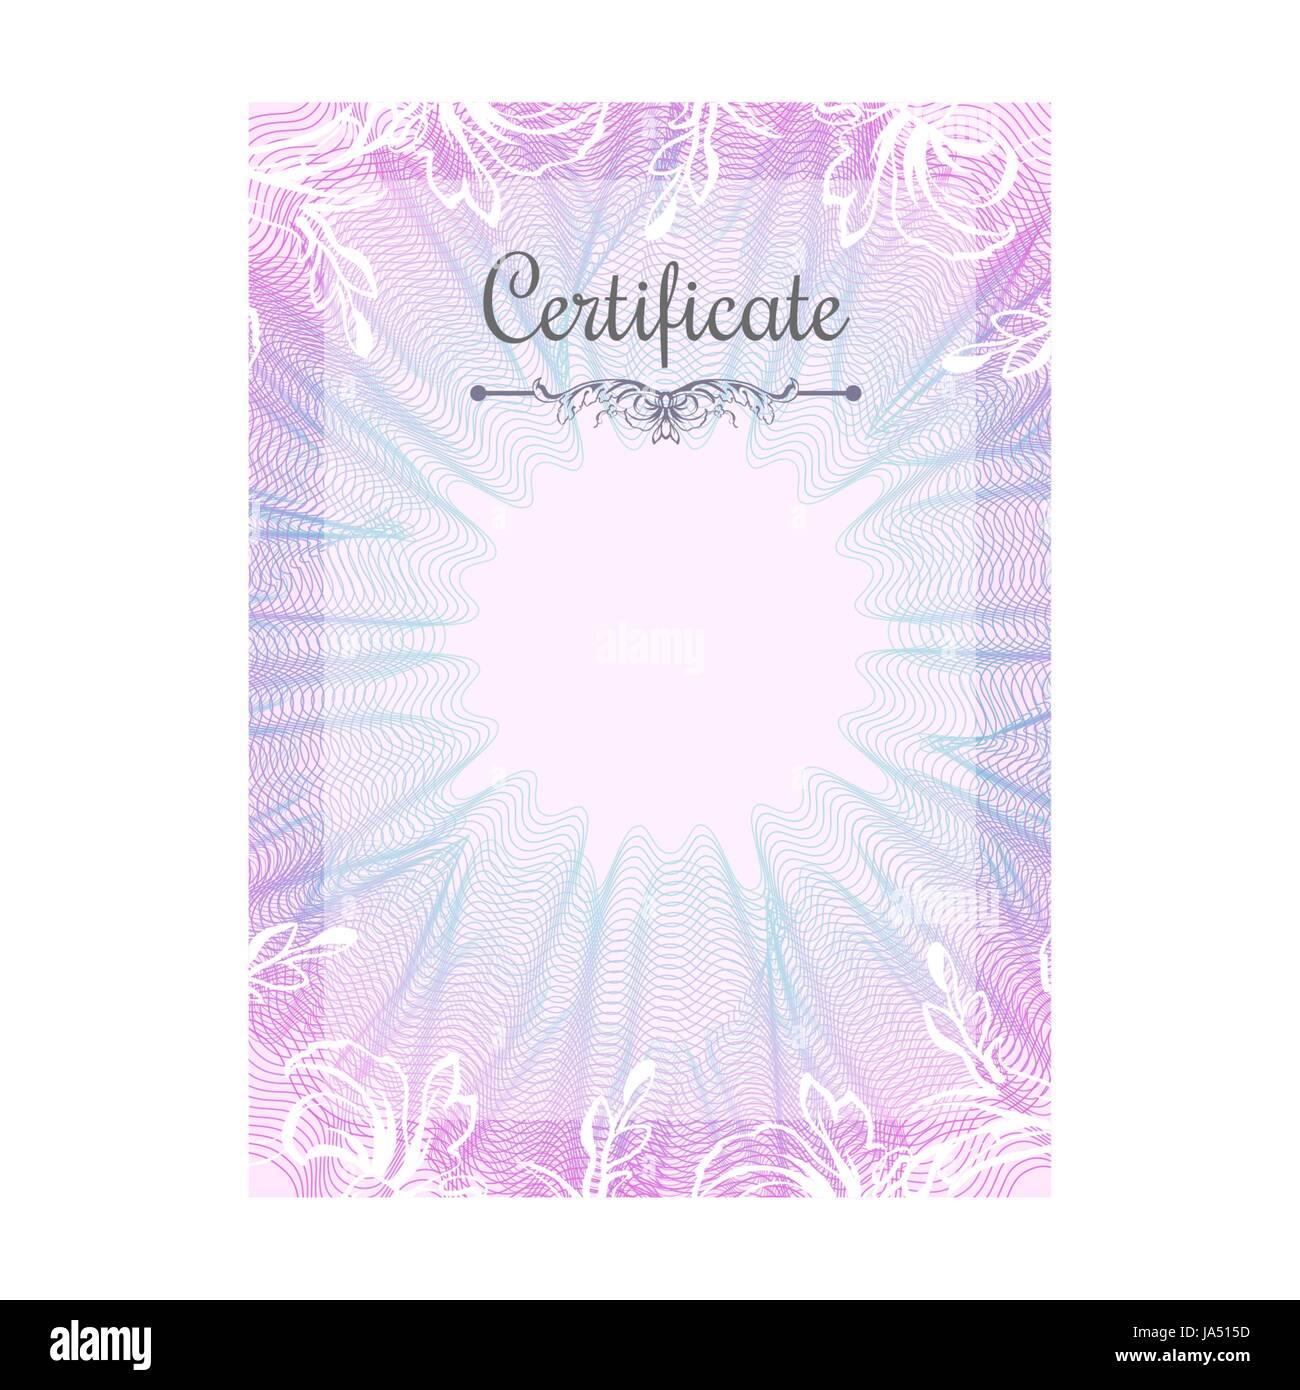 Guilloche offizielle rosa Zertifikat mit Rahmen Vektor Abbildung ...